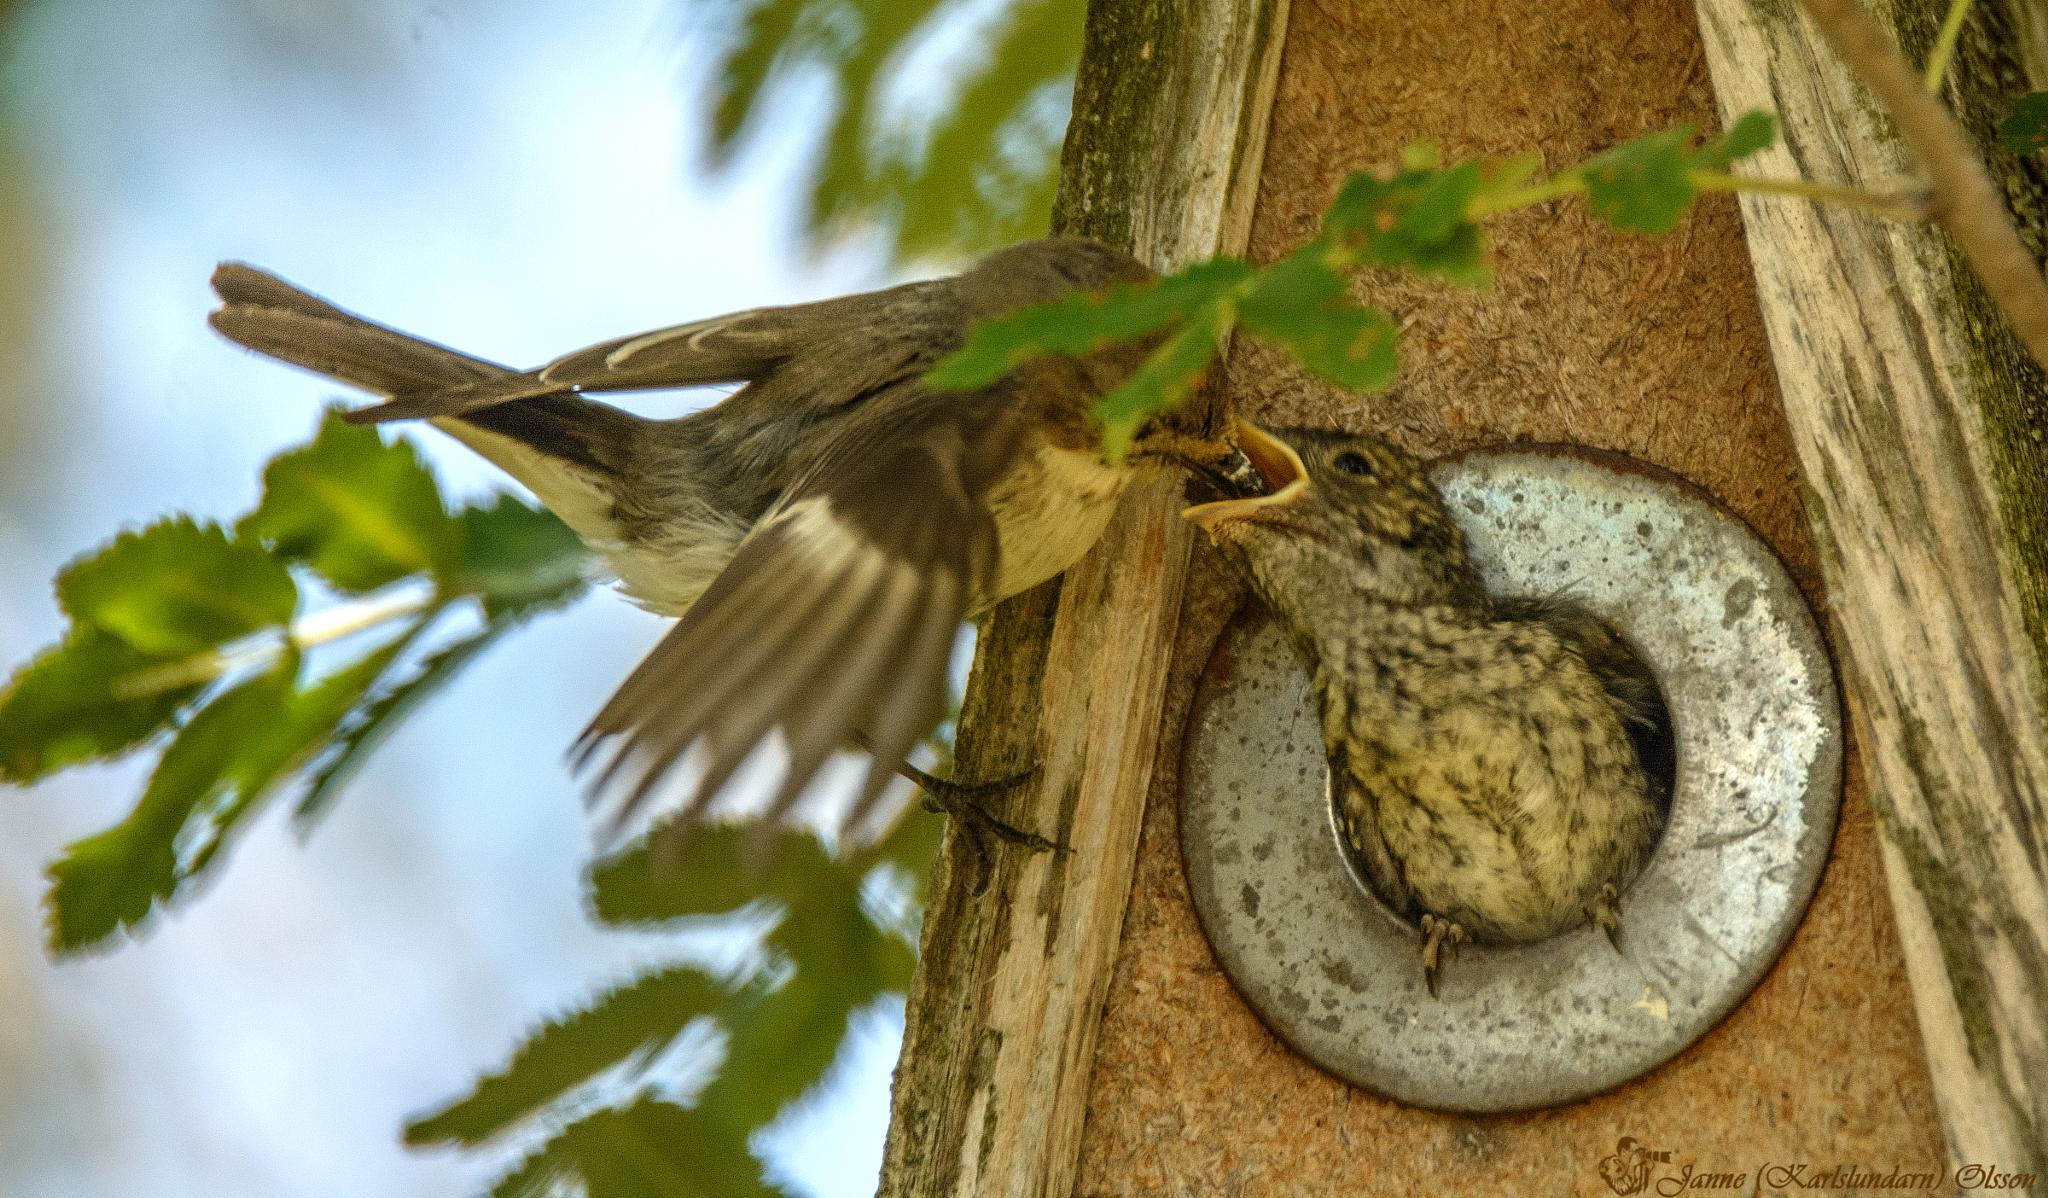 Honan Svartvit flugsnappare (Ficedula hypoleuca) matar sina ungar by (Karlslundarn)